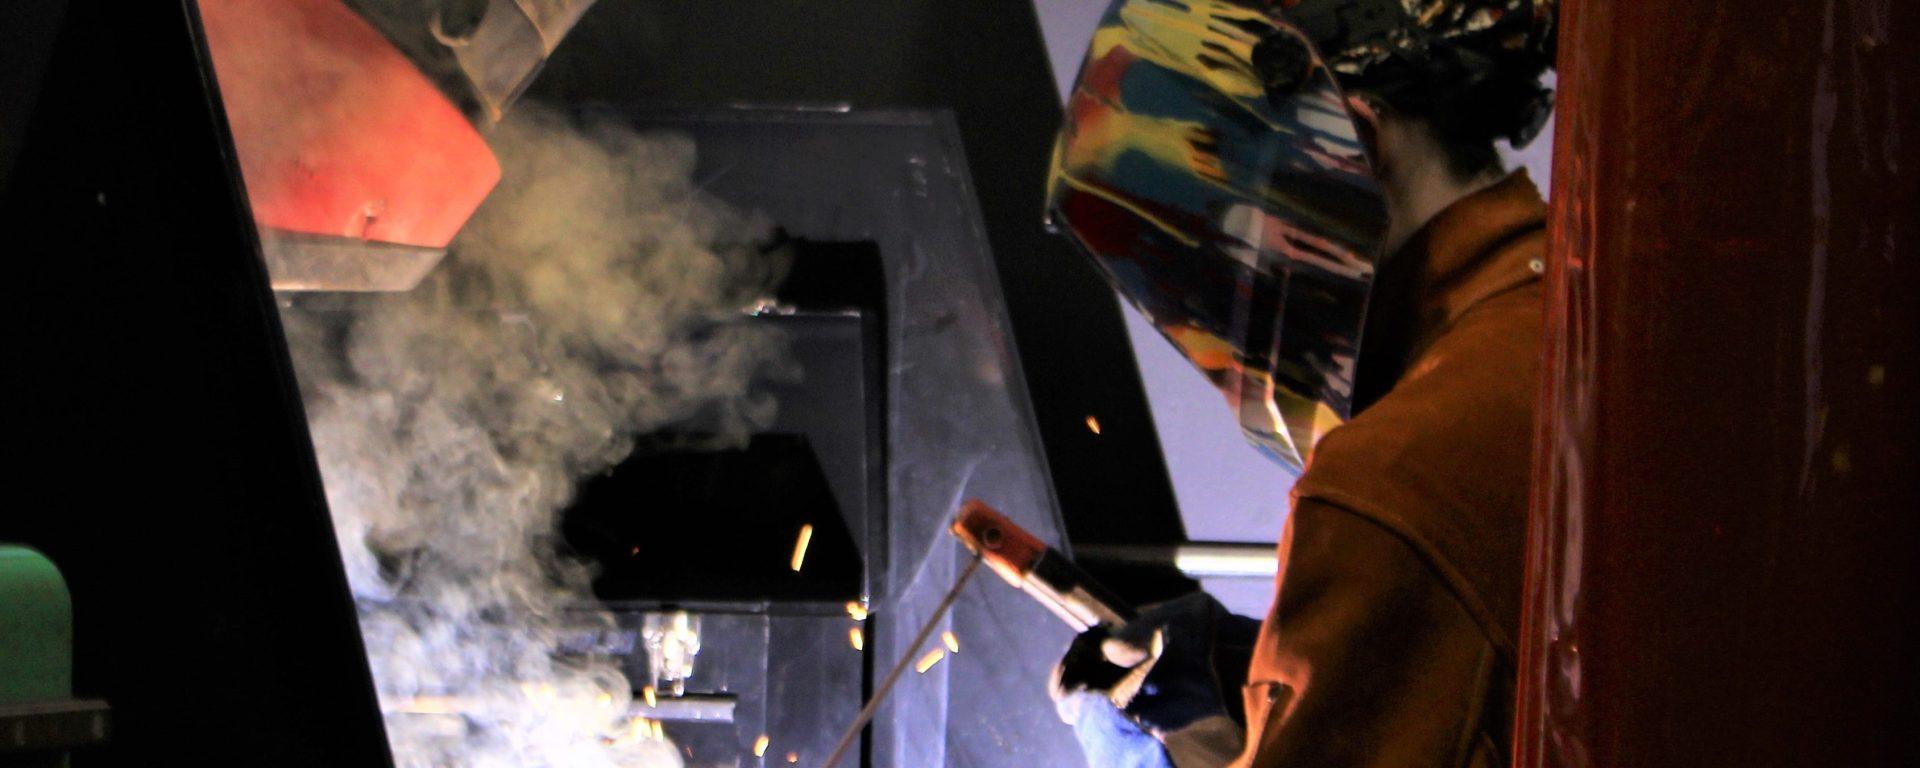 Goodwin college welding program testimonial story